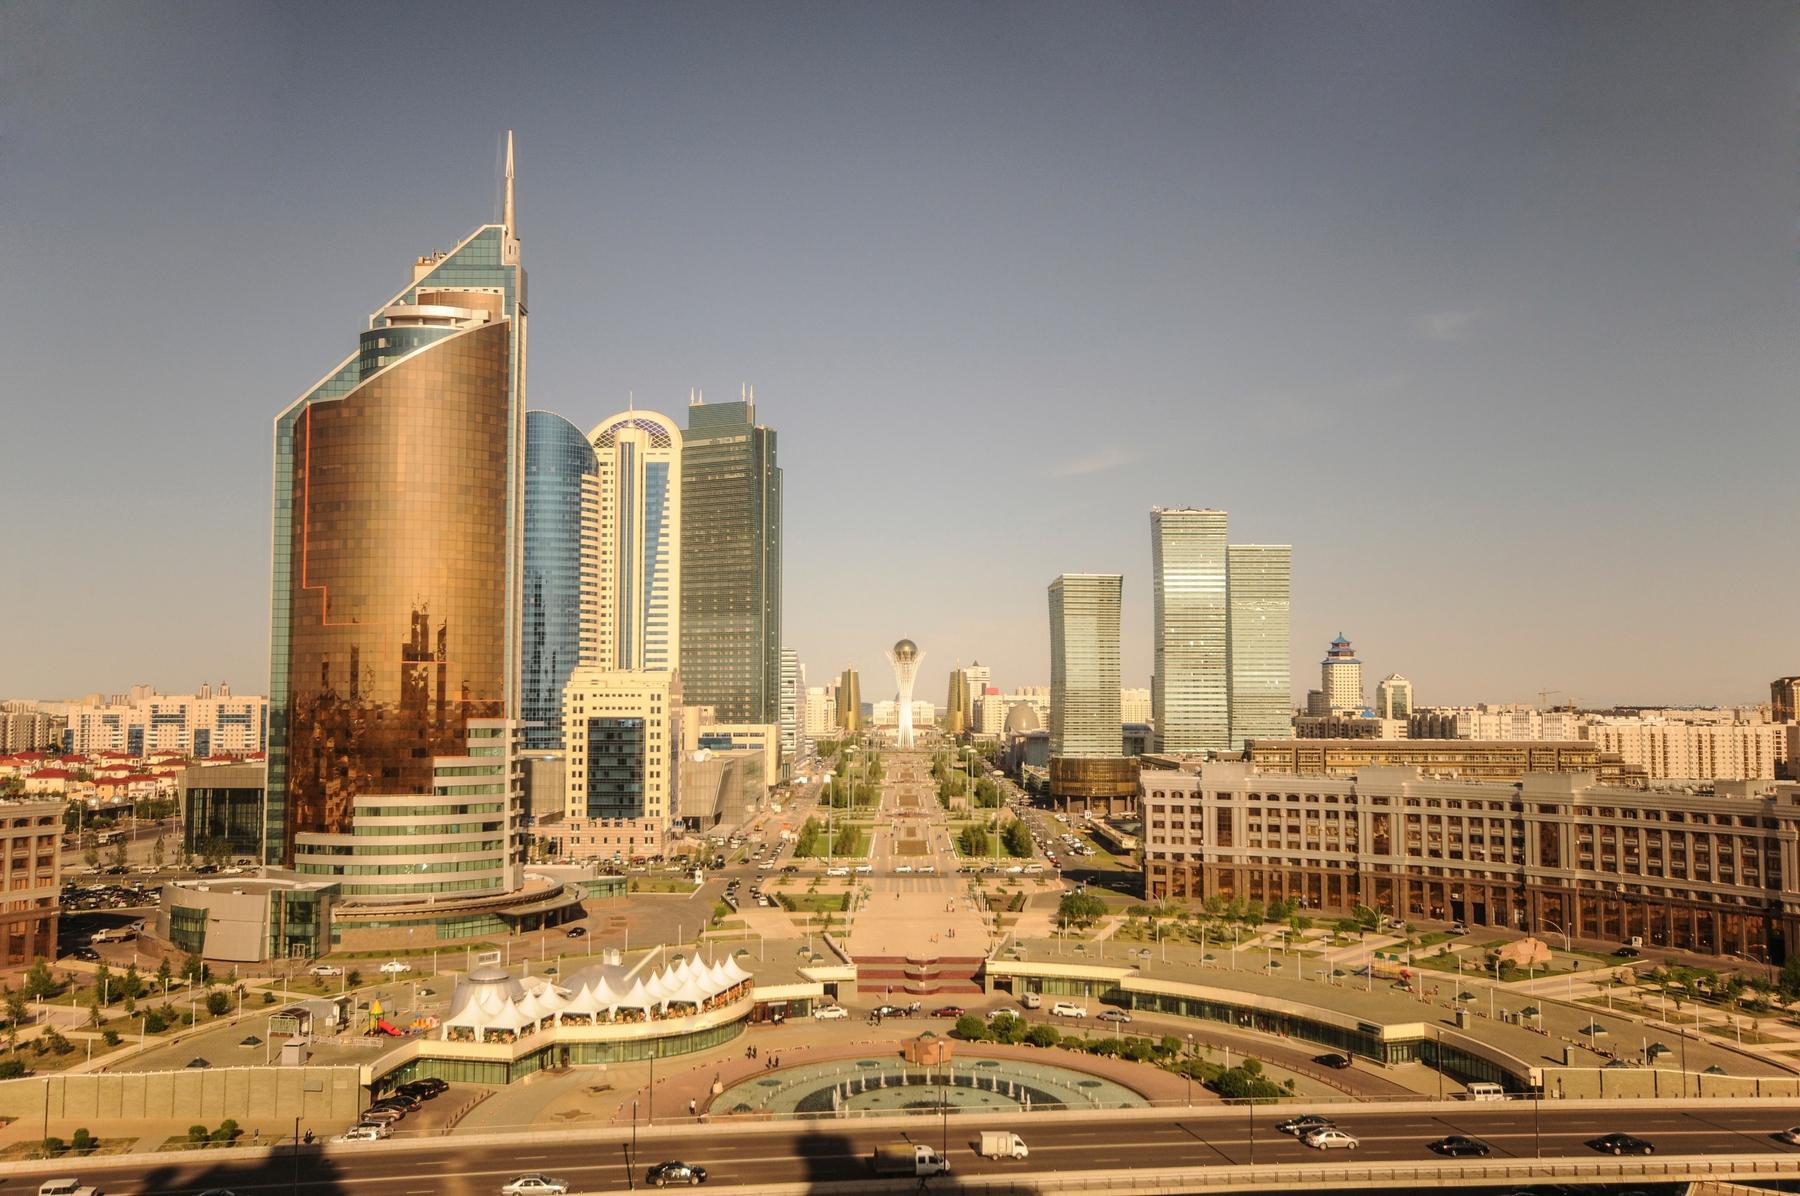 Países más grandes: Rascacielos en Astana, capital de Kazajistán